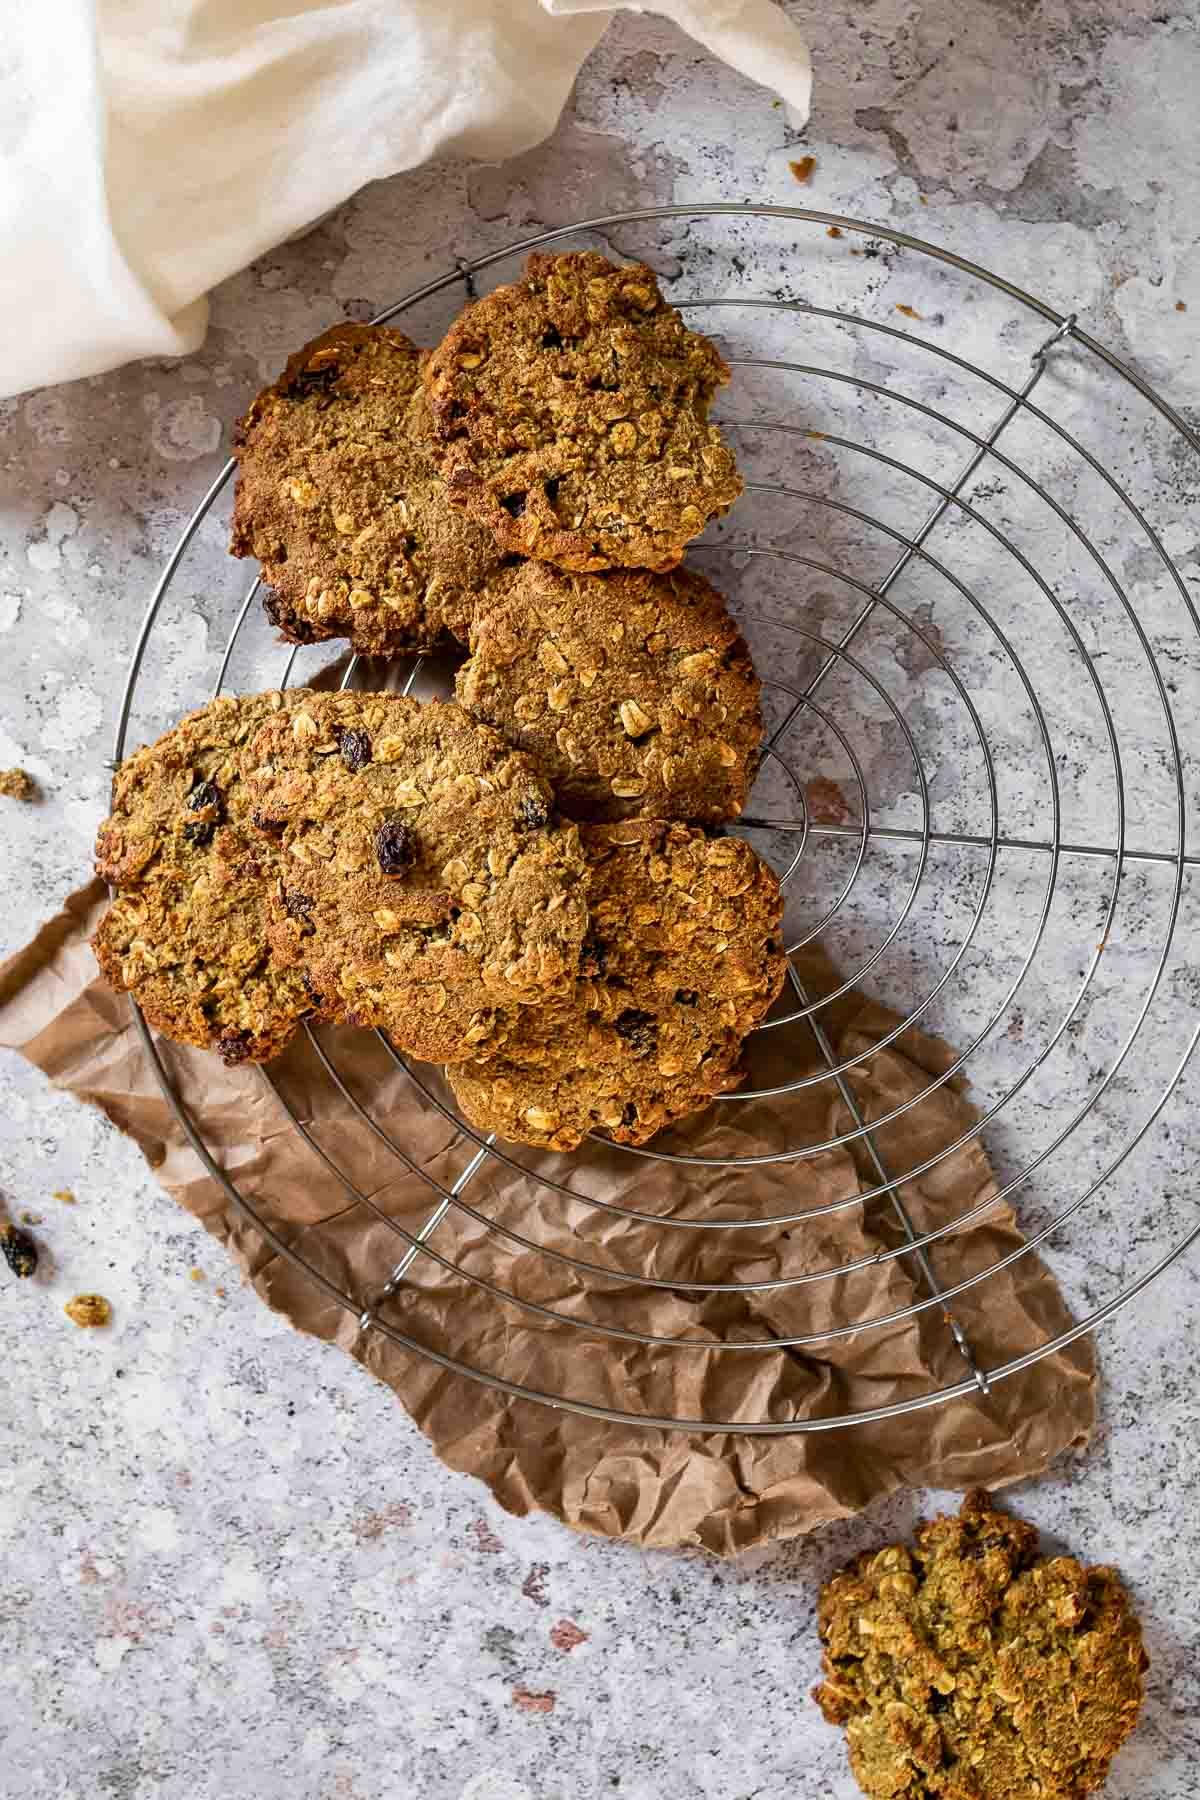 Bird view of a wire rack with vegan oat cookies